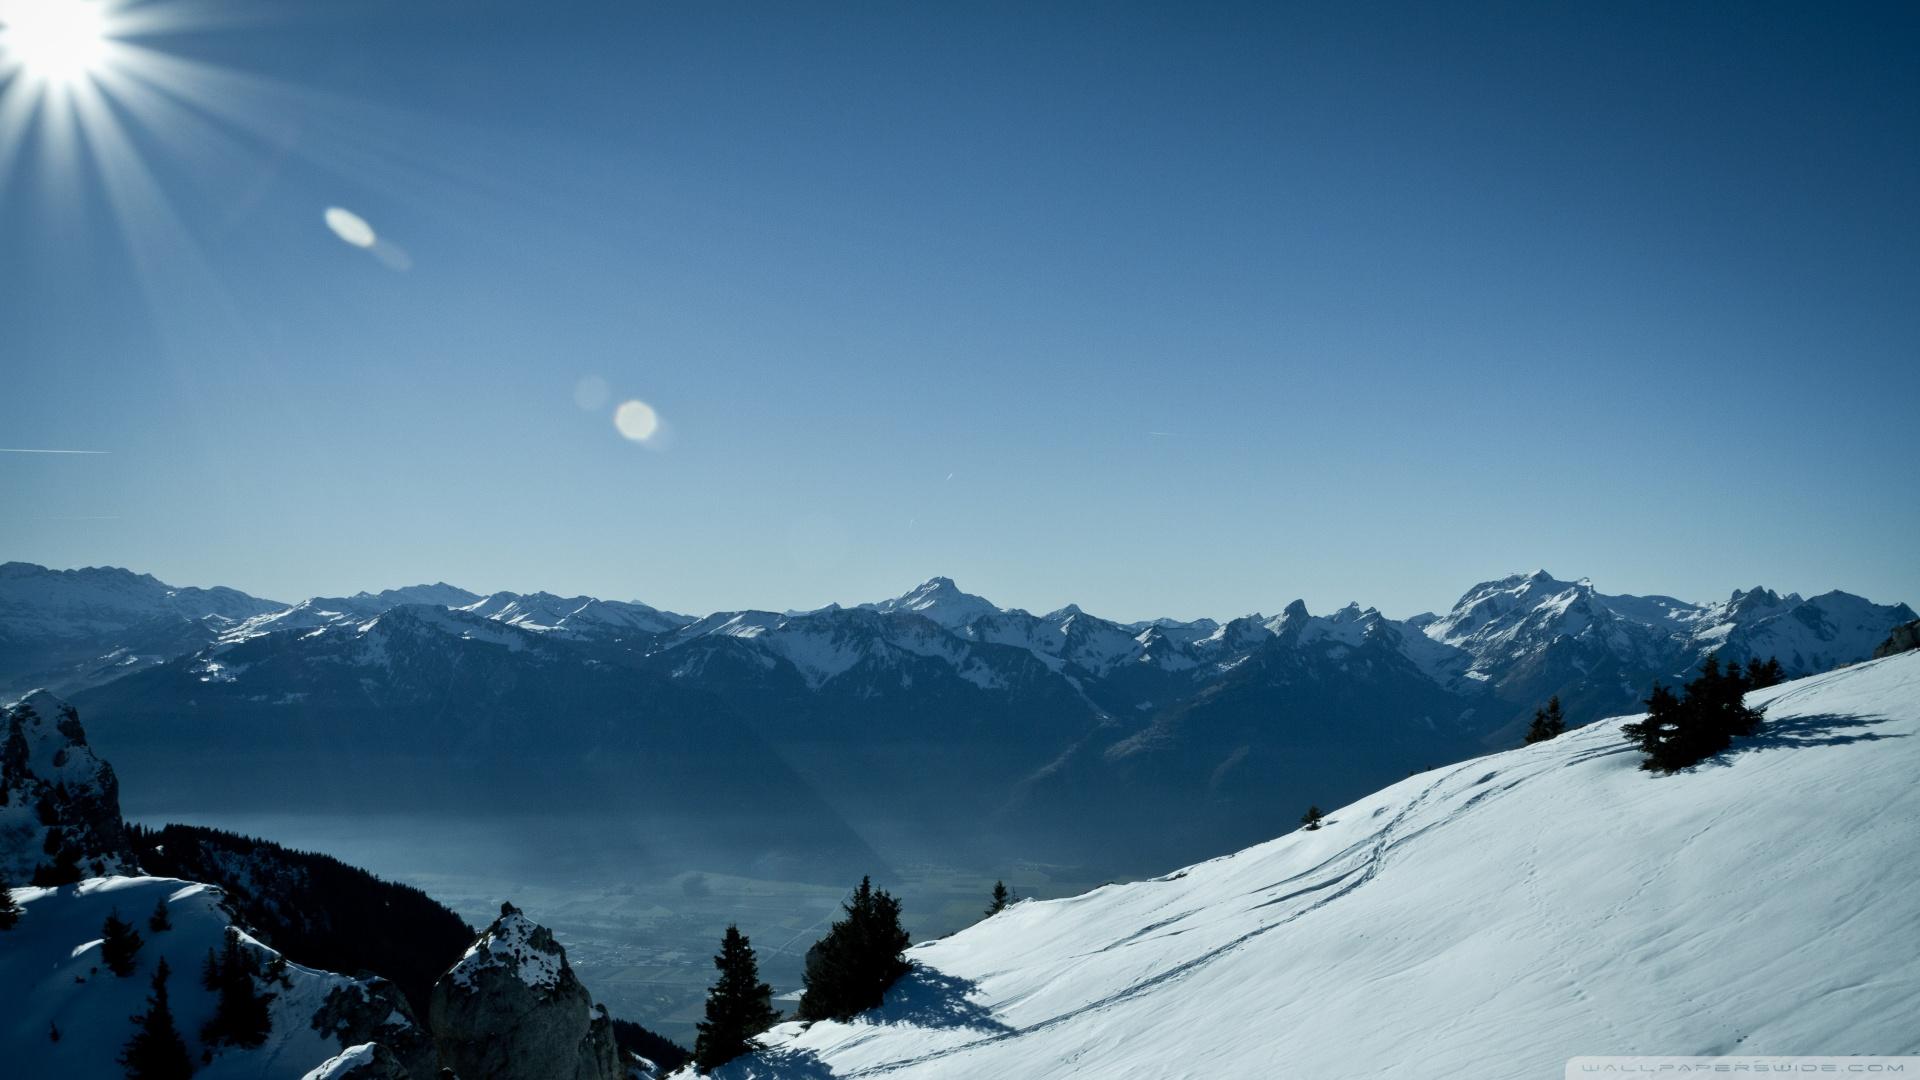 Hd Wallpaper Switzerland Mountains Winter 4k Hd Desktop Wallpaper For